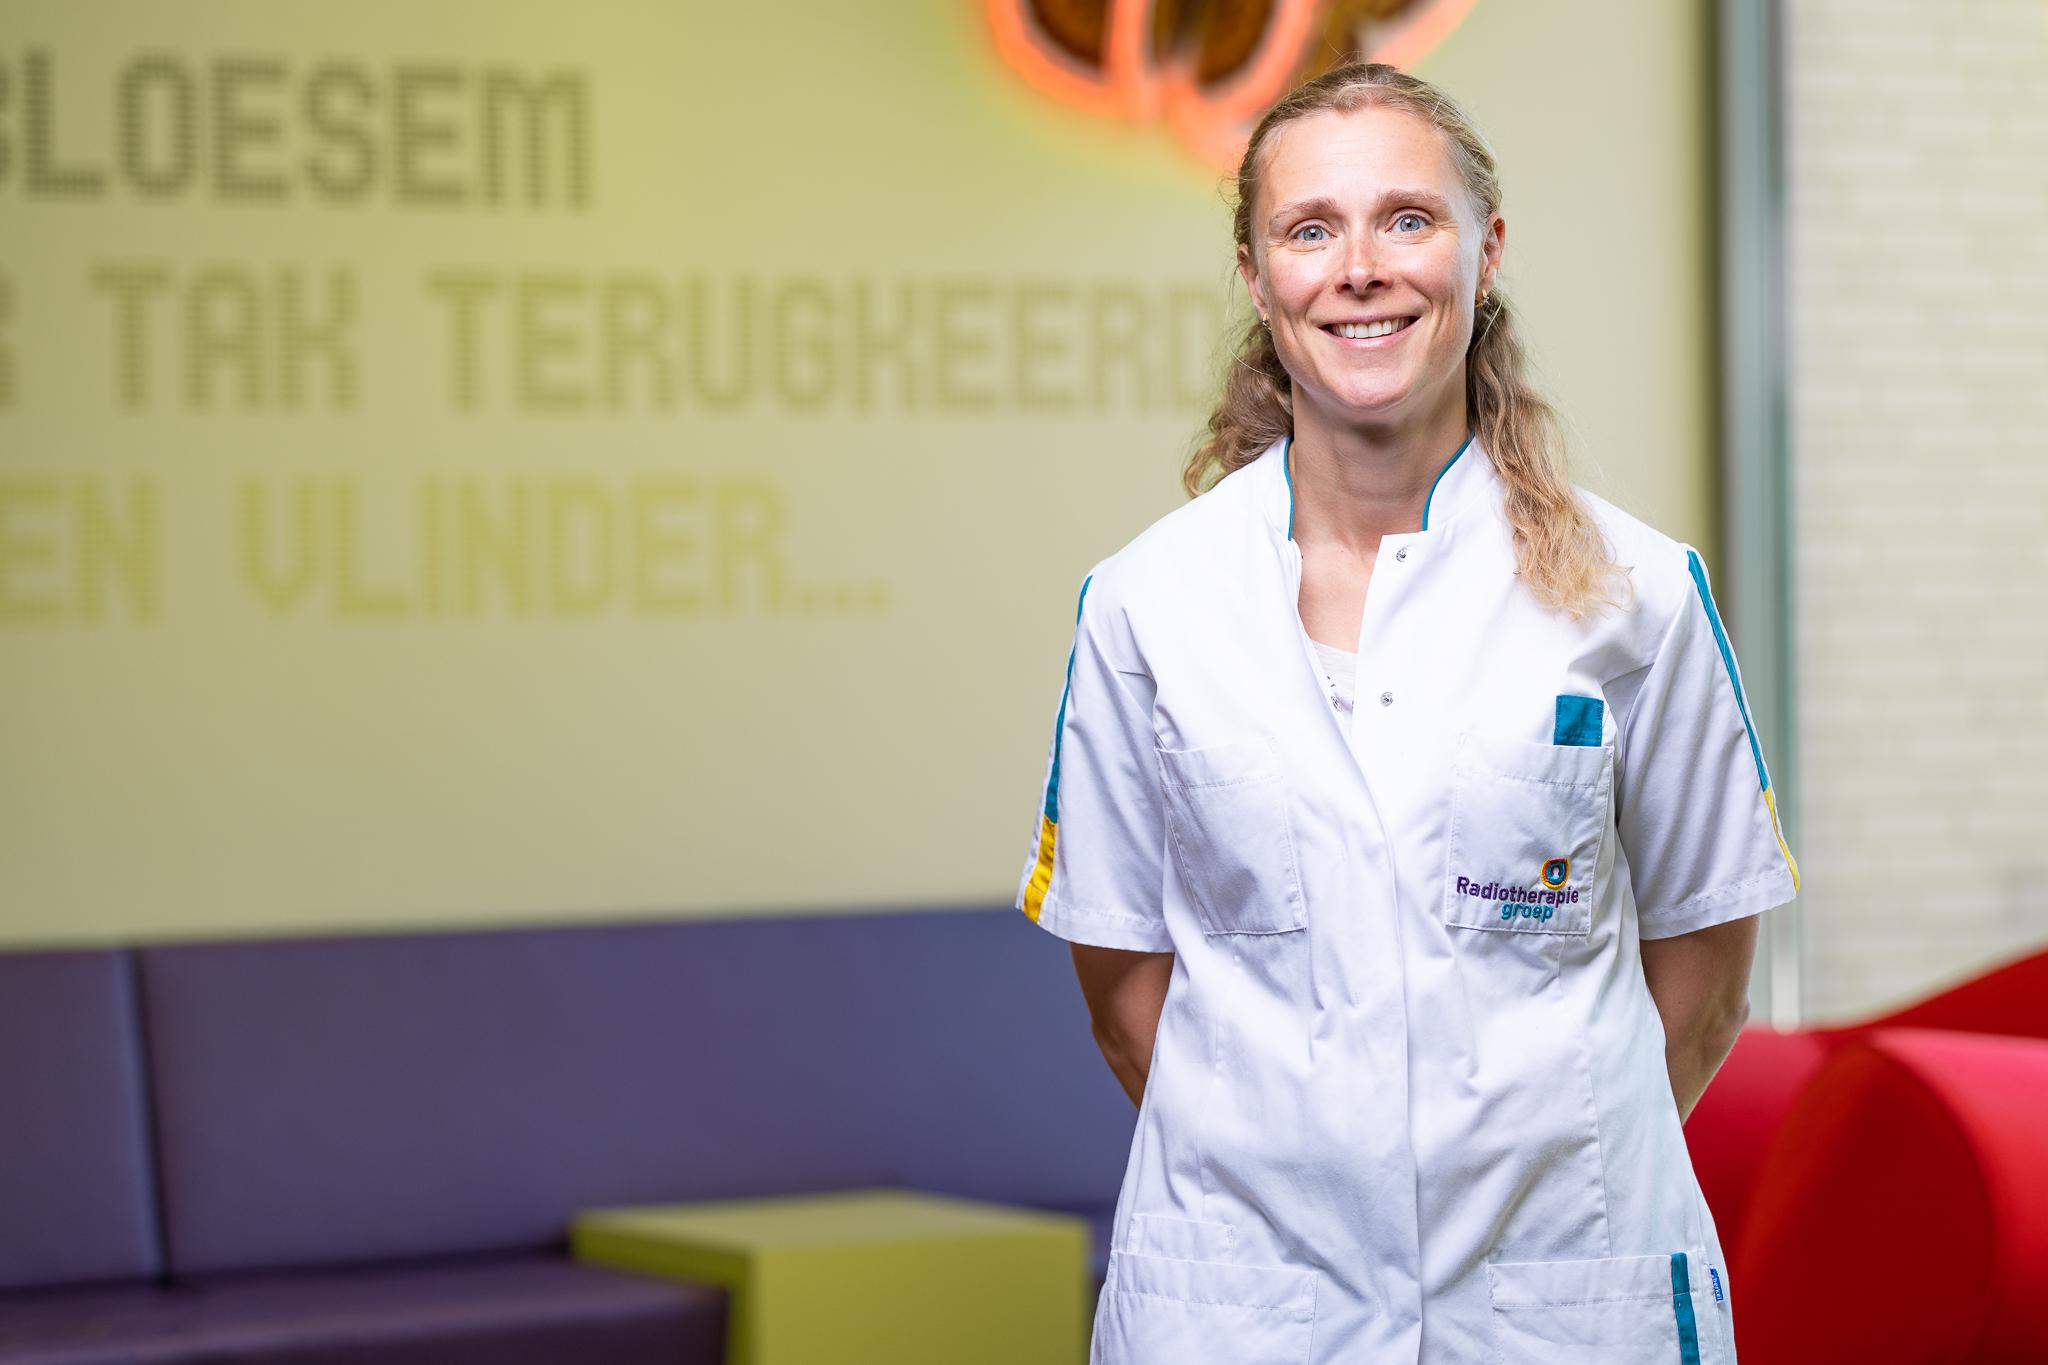 Radiation oncologist Dorien Haverkort